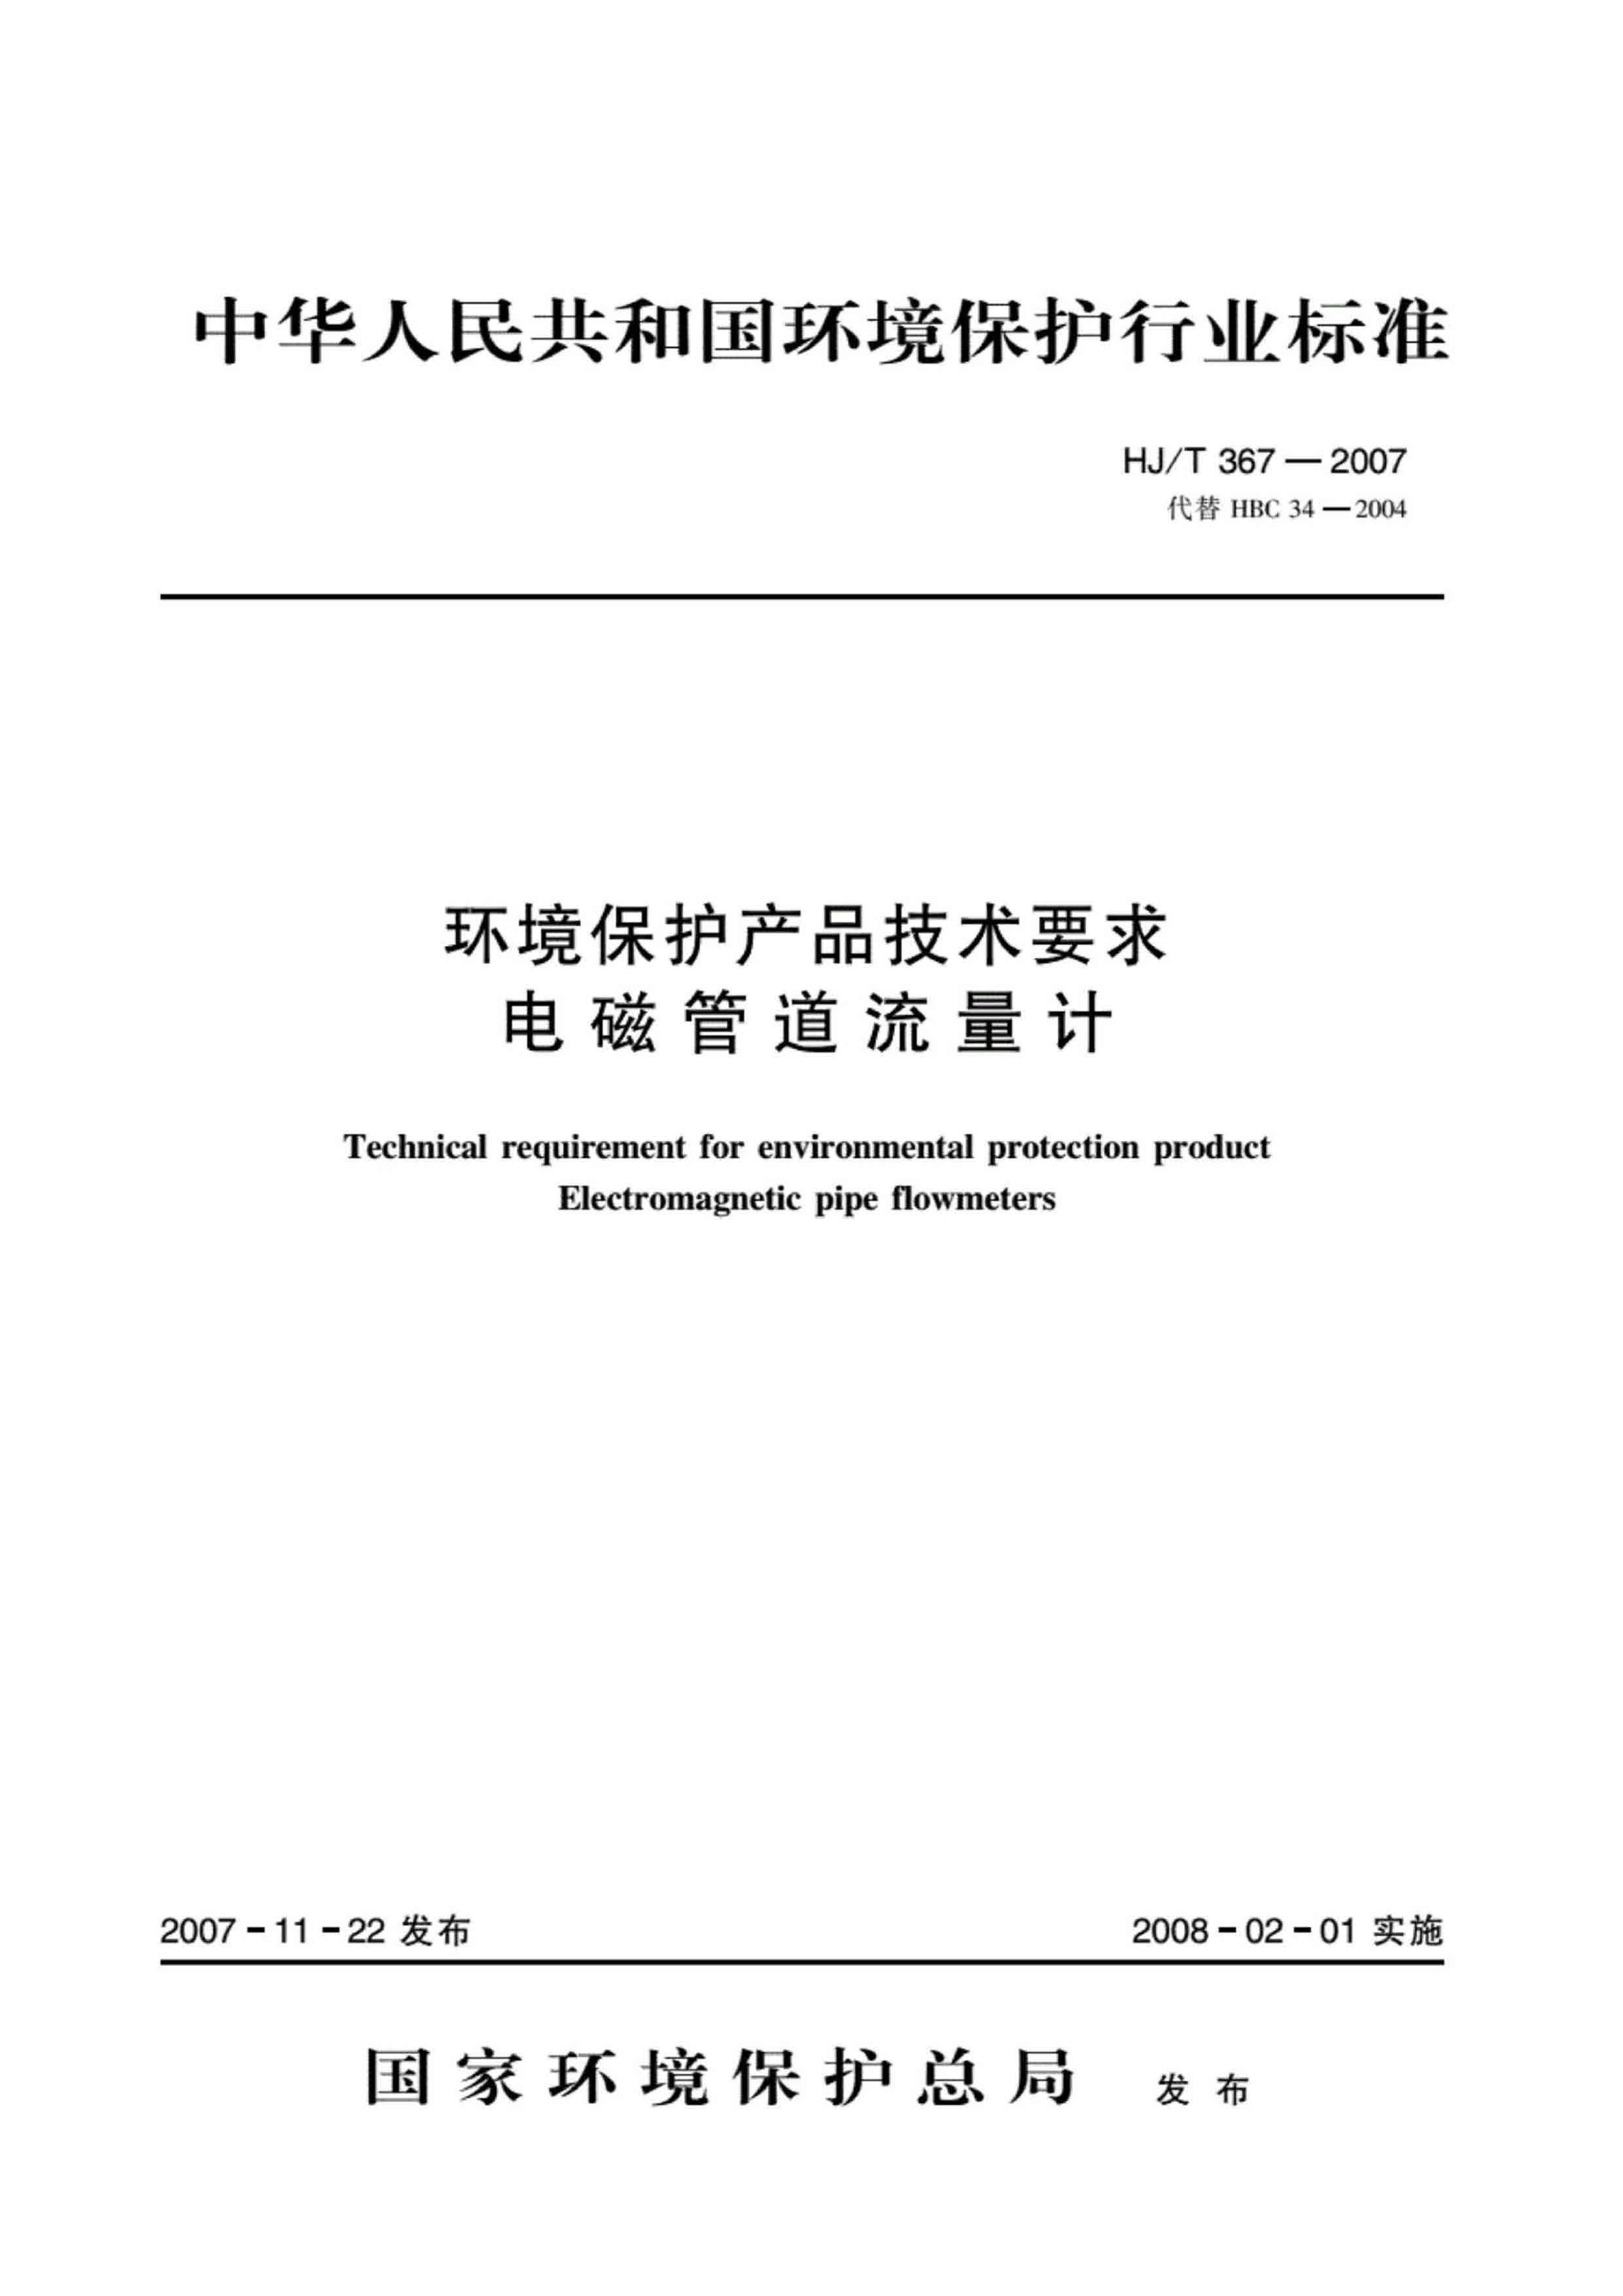 HJ-T367-2007 环境保护产品技术要求 电磁管道流量计 下载